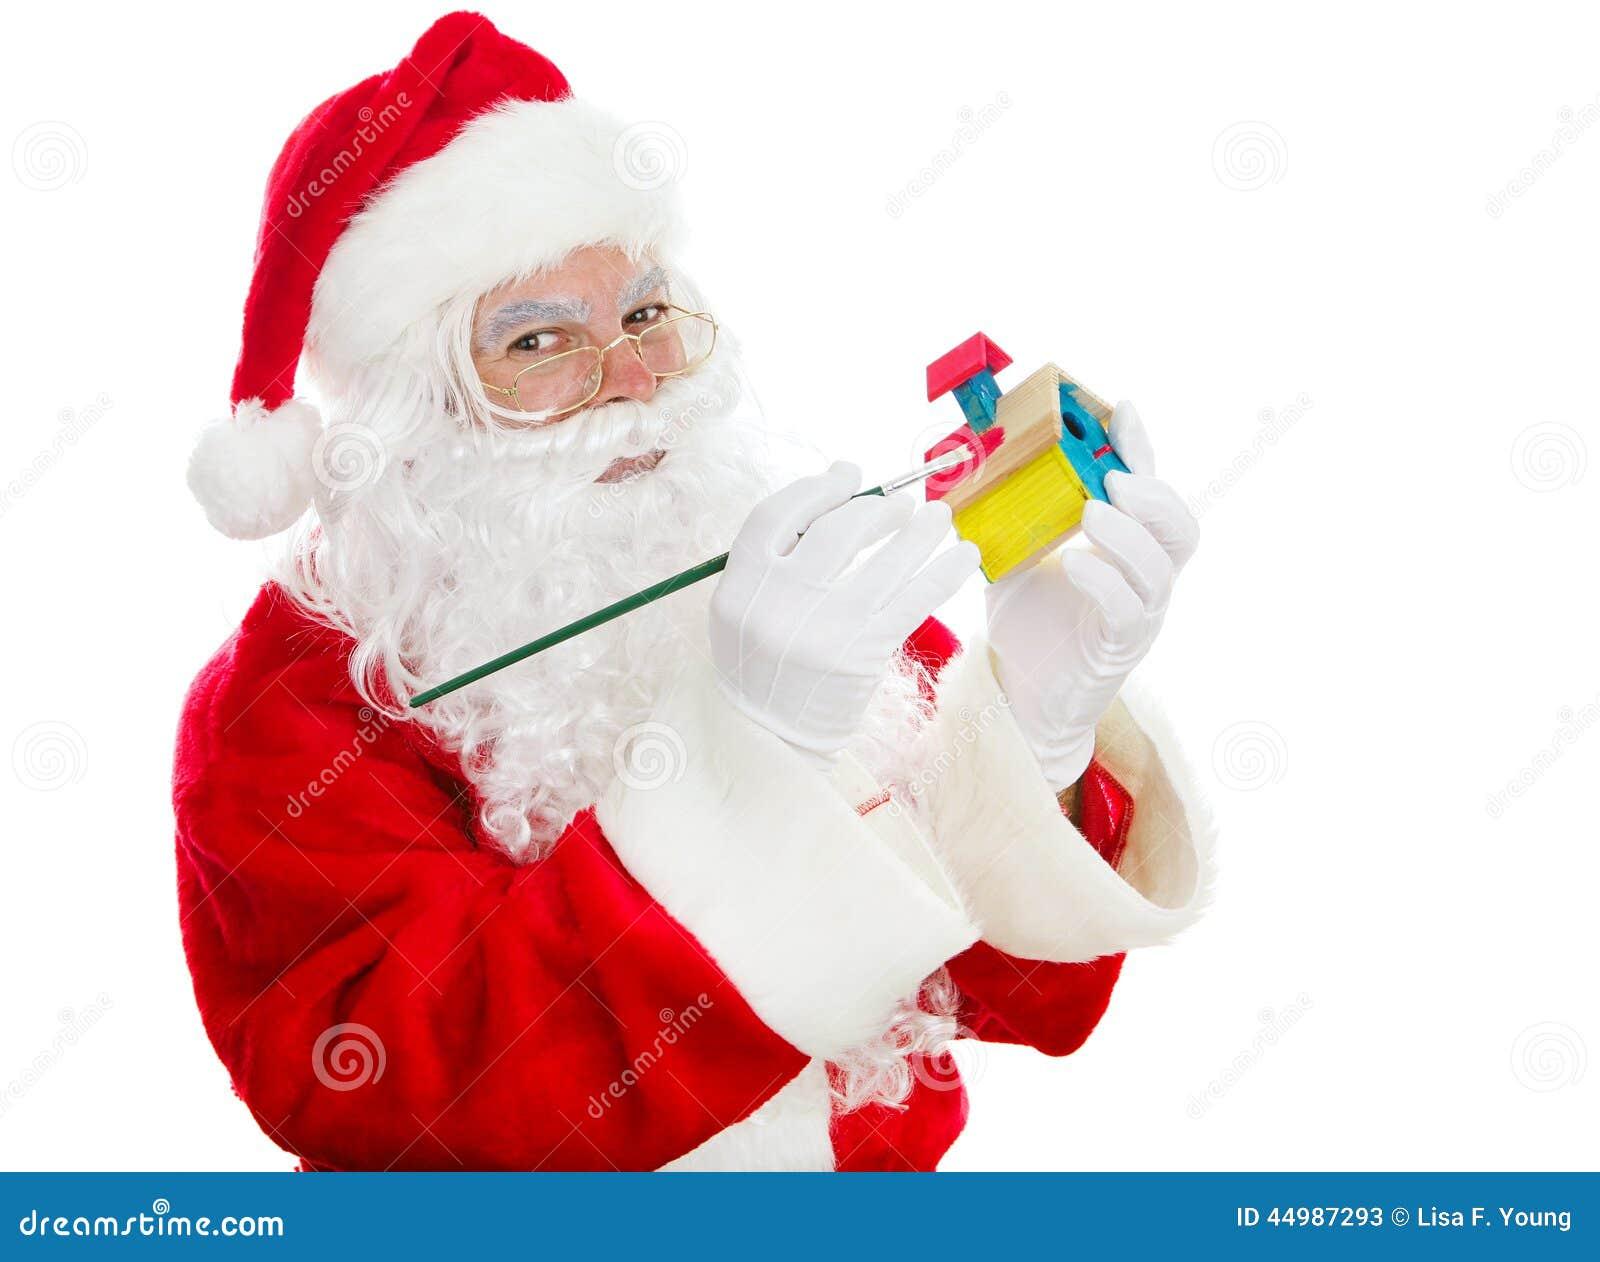 Santas Christmas Toy Shop